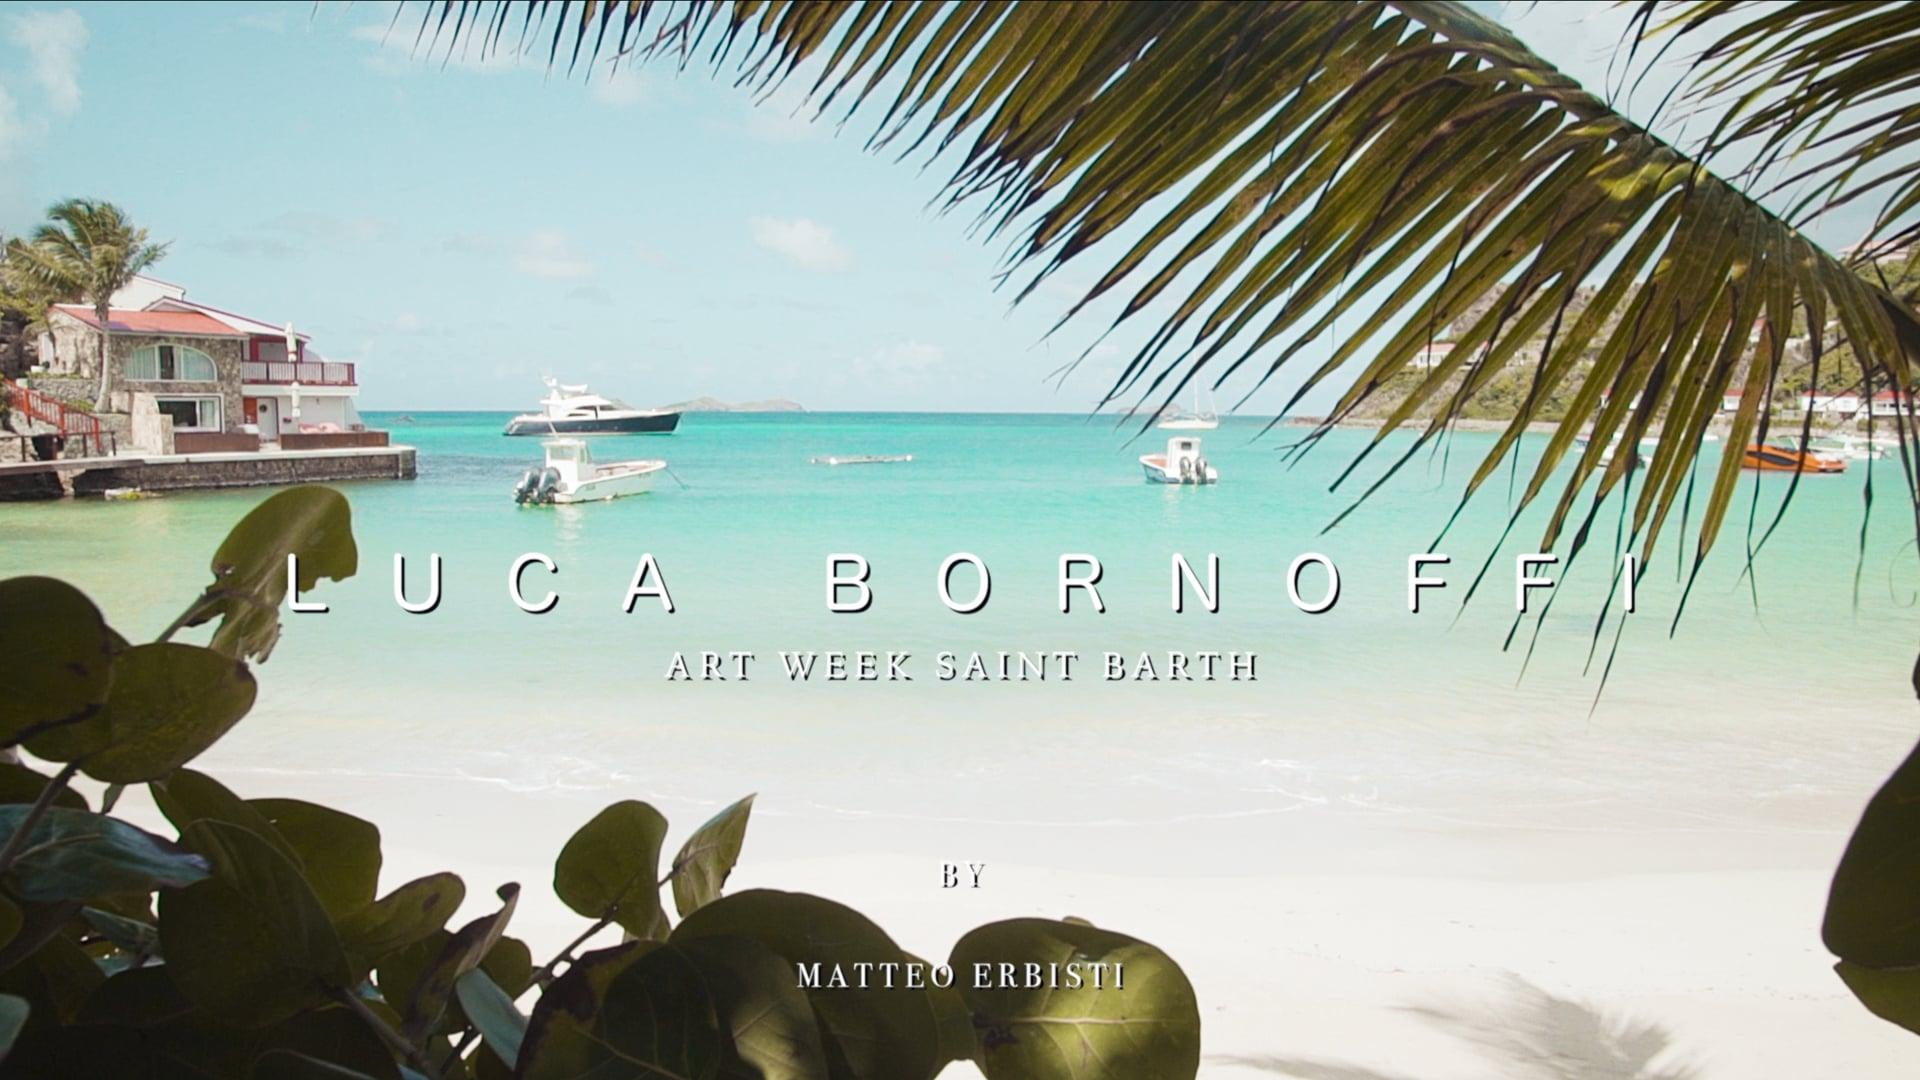 BORNOFFI X ST BARTH ART WEEK